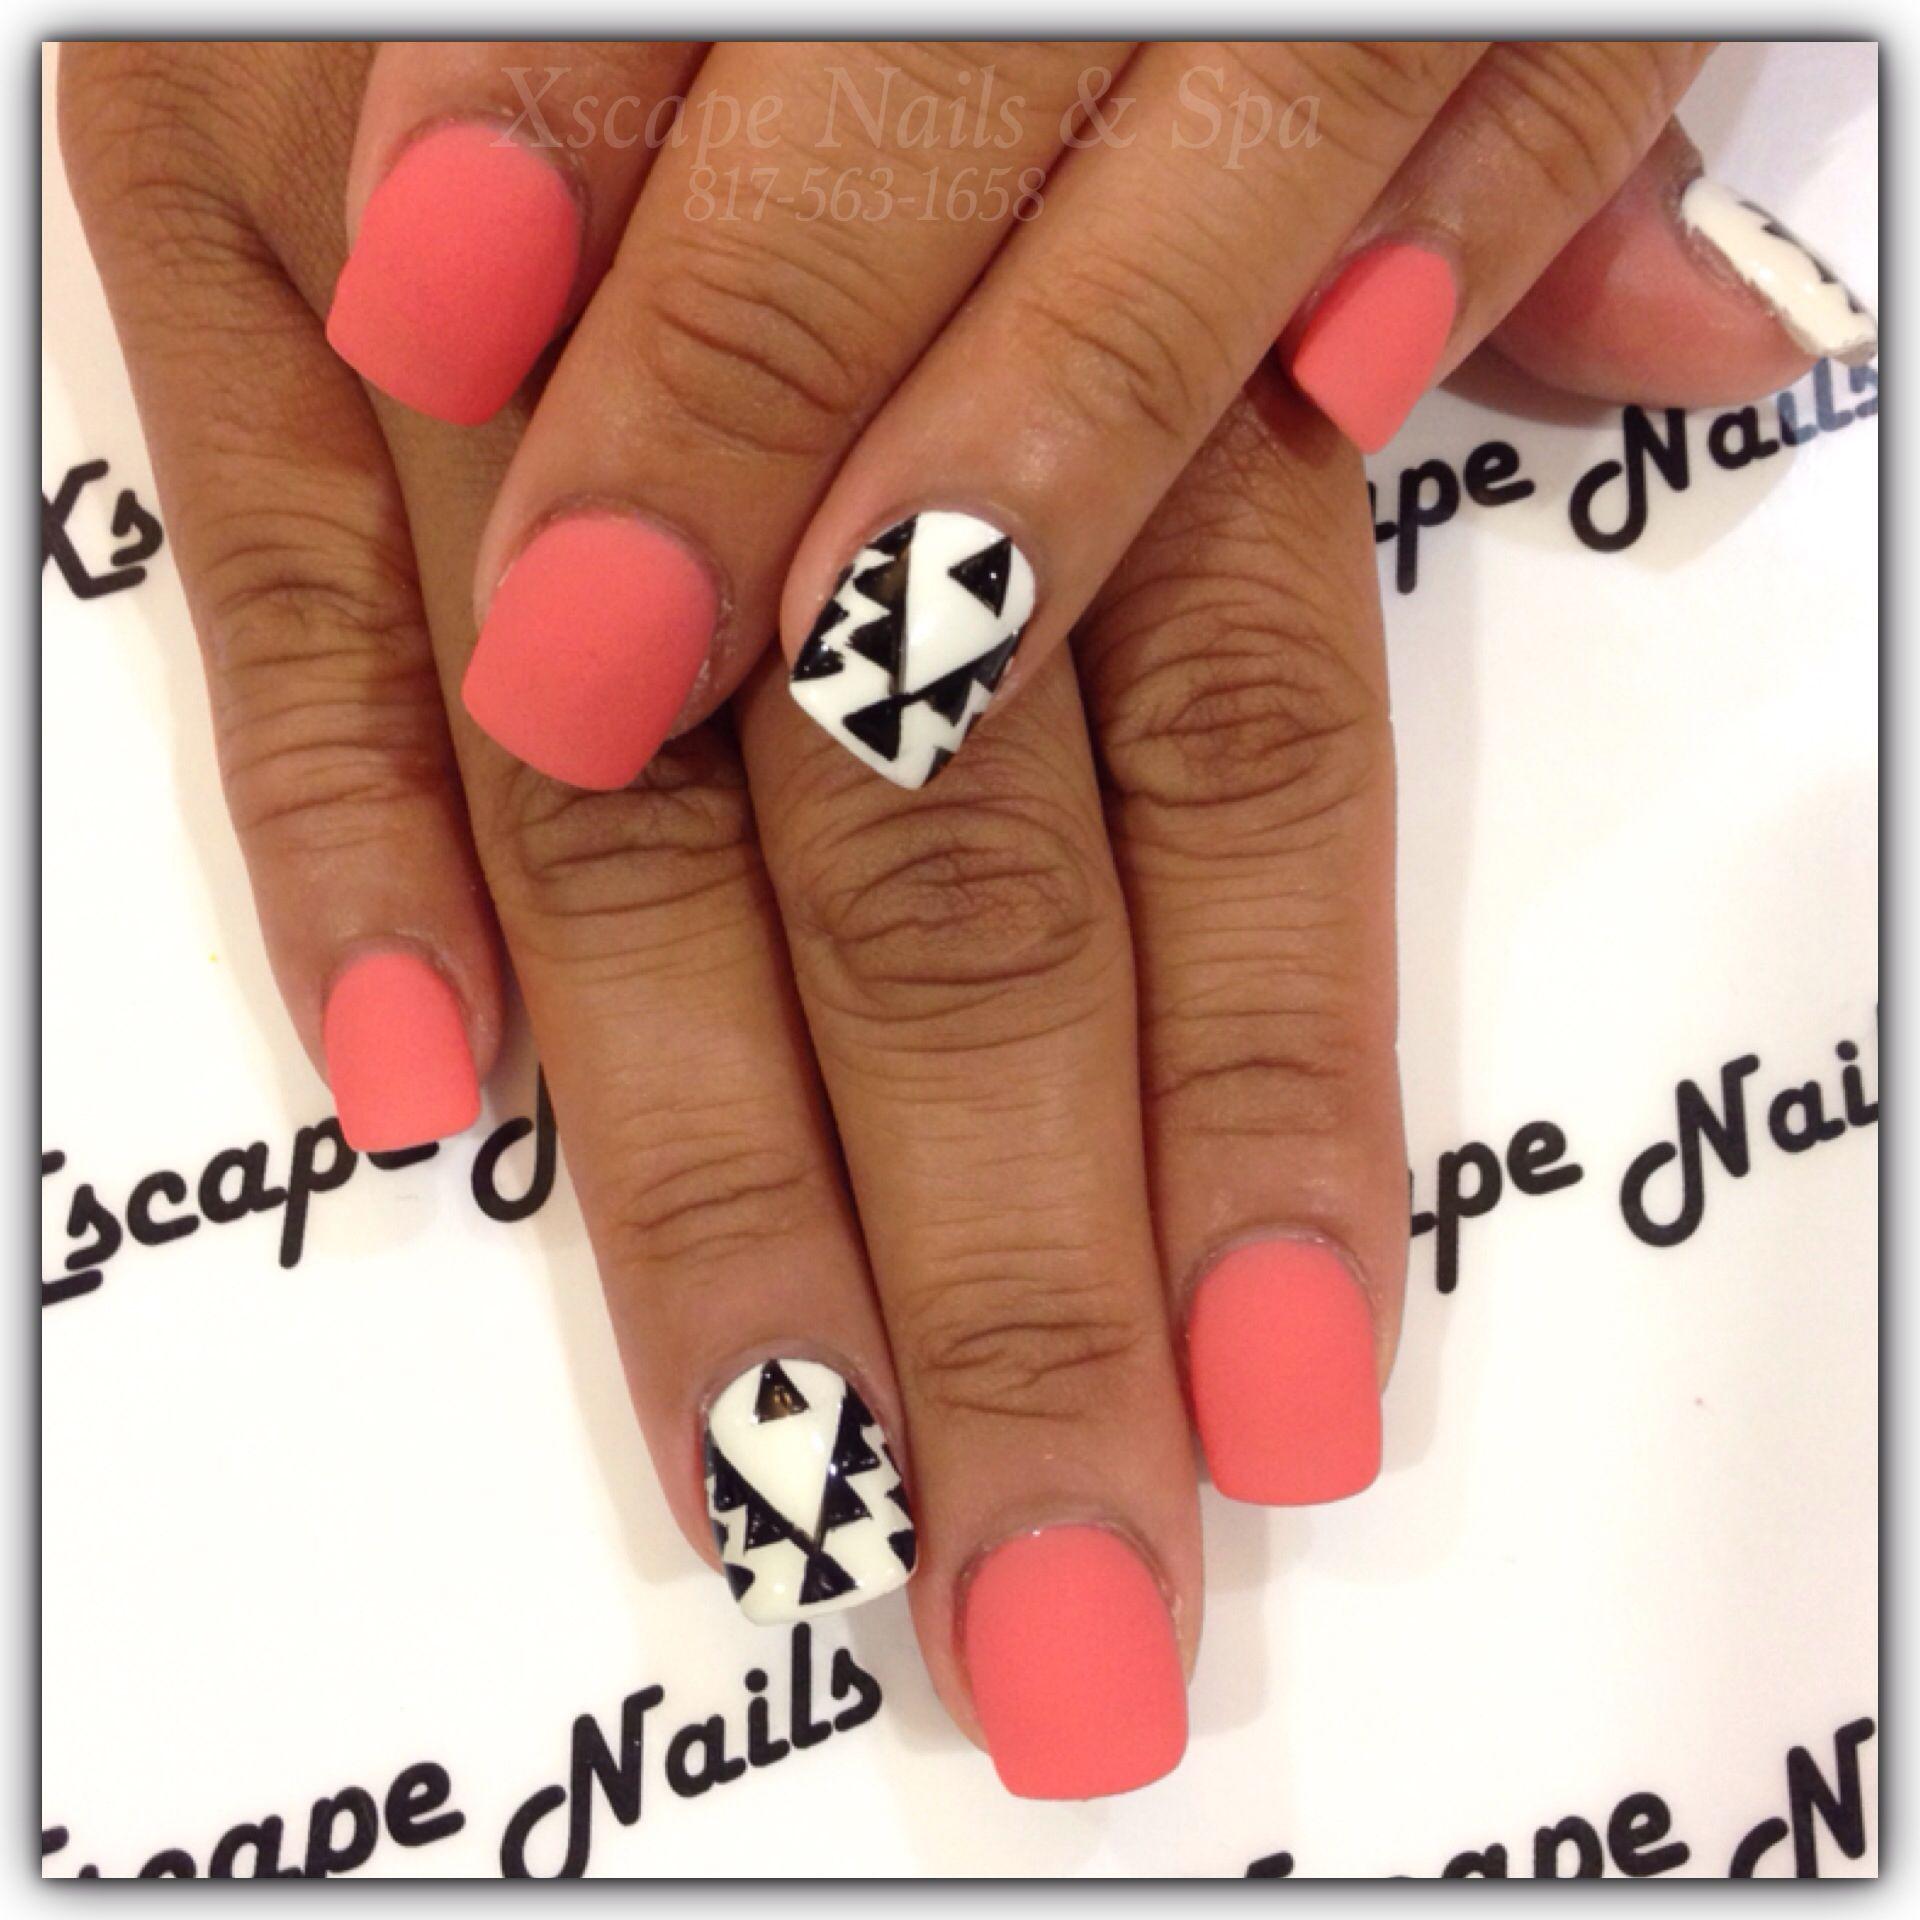 aztec nail design cute nails